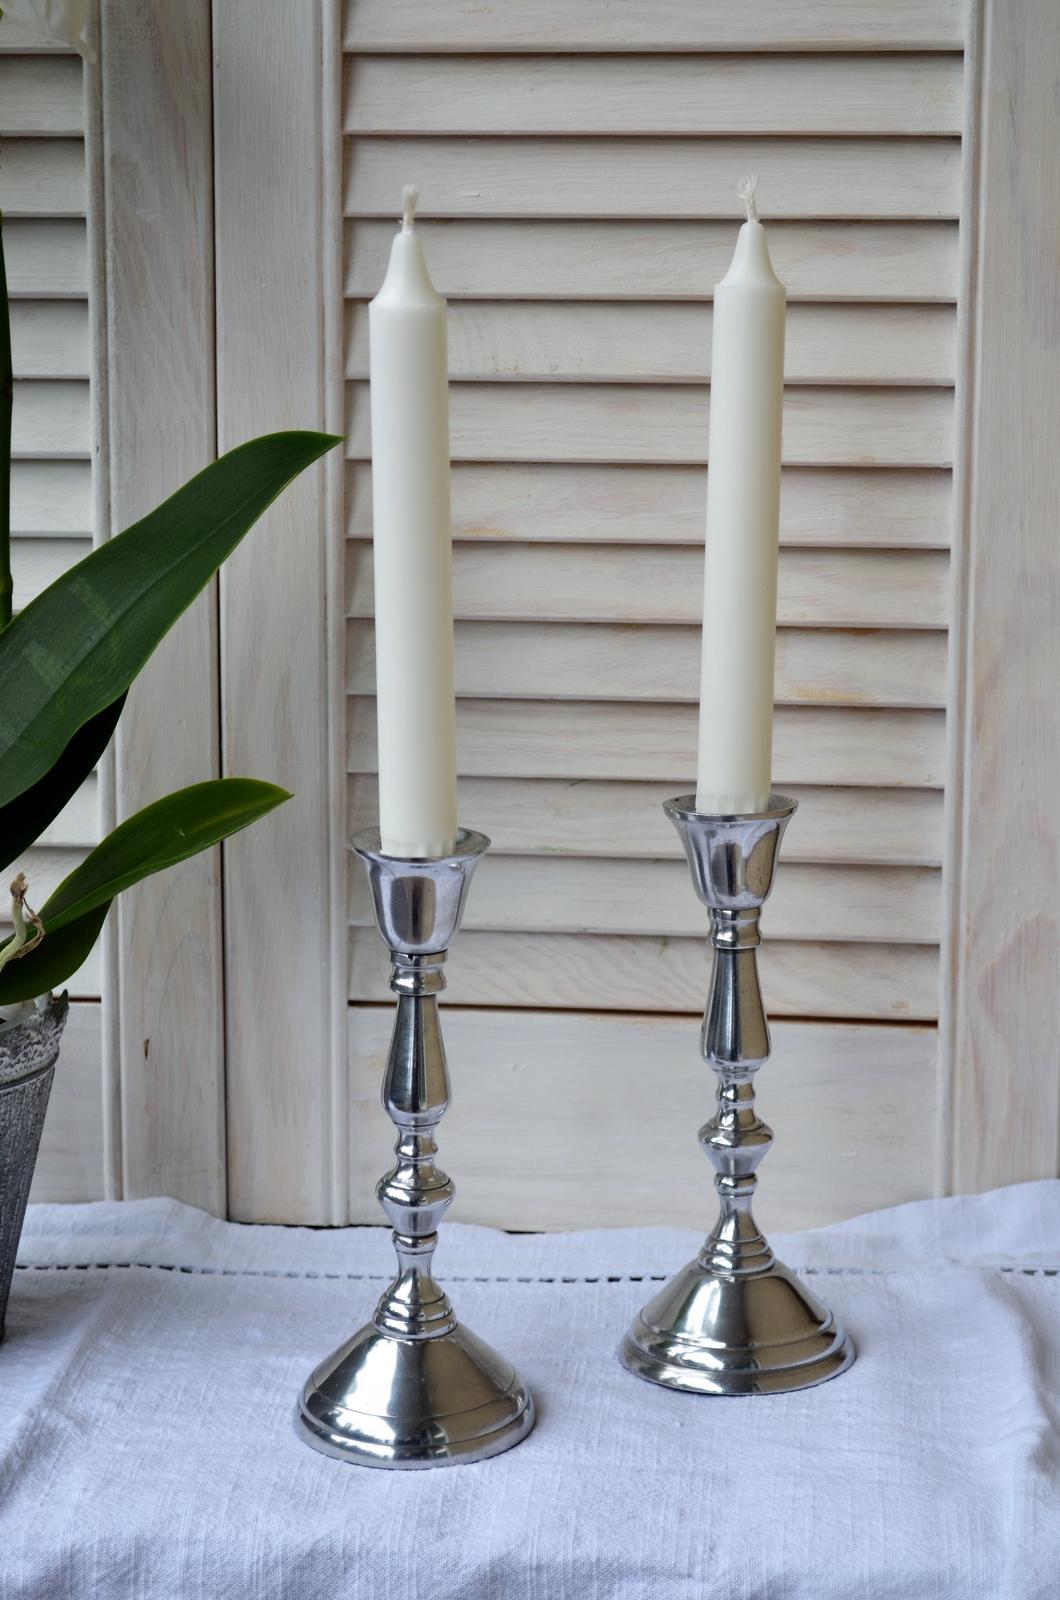 Svietnik na kónickú sviečku - Obrázok č. 1